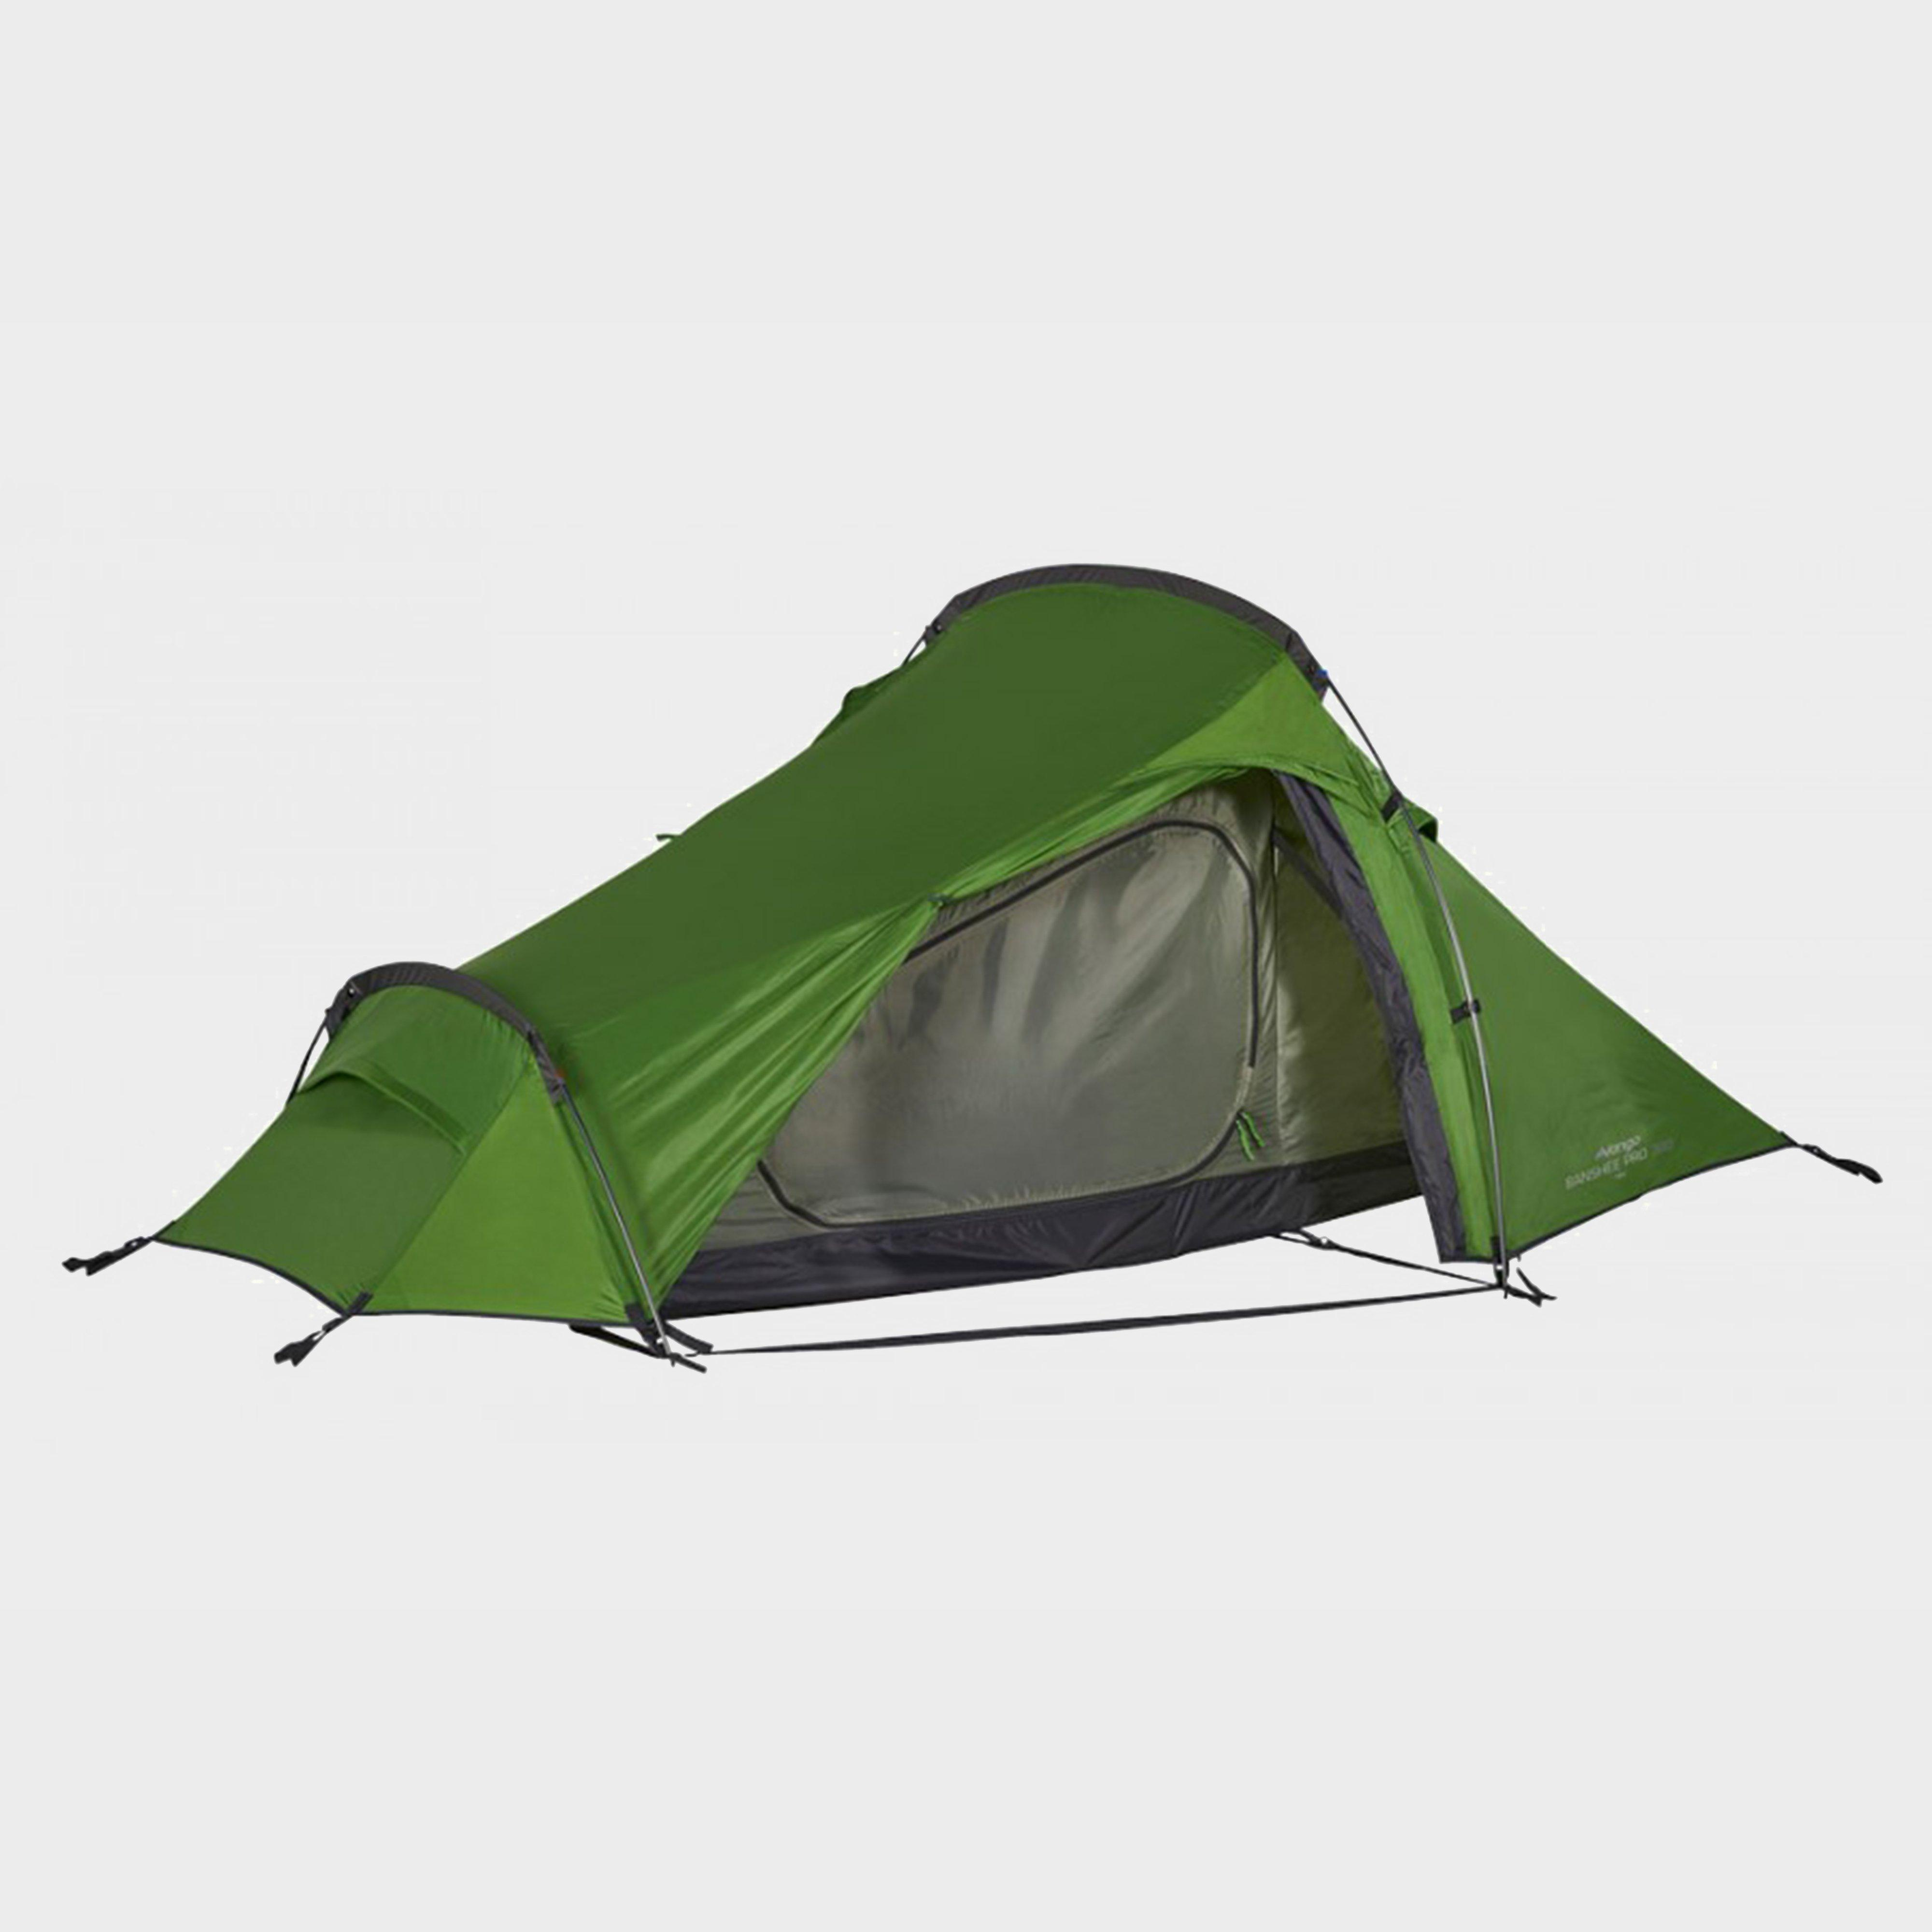 Vango Vango Banshee 300 Pro Backpacking Tent - Green, Green